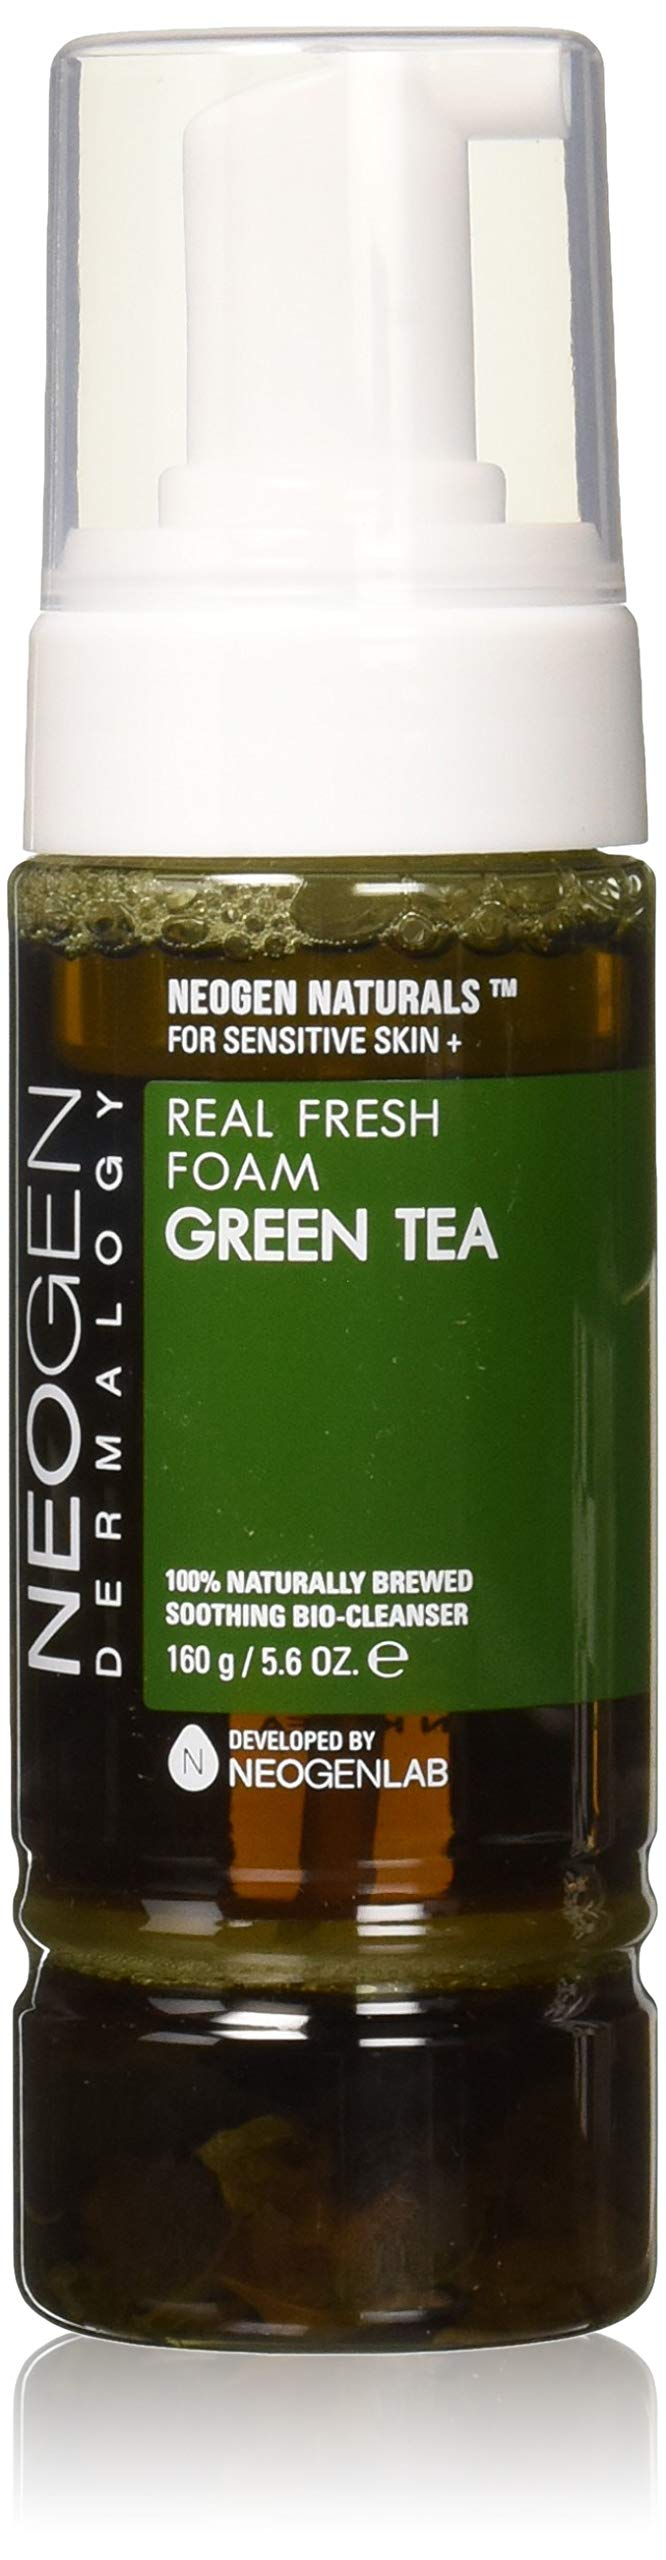 NEOGEN Dermalogy Real Fresh cleansing Foam,160g /5.6 oz (Green Tea)